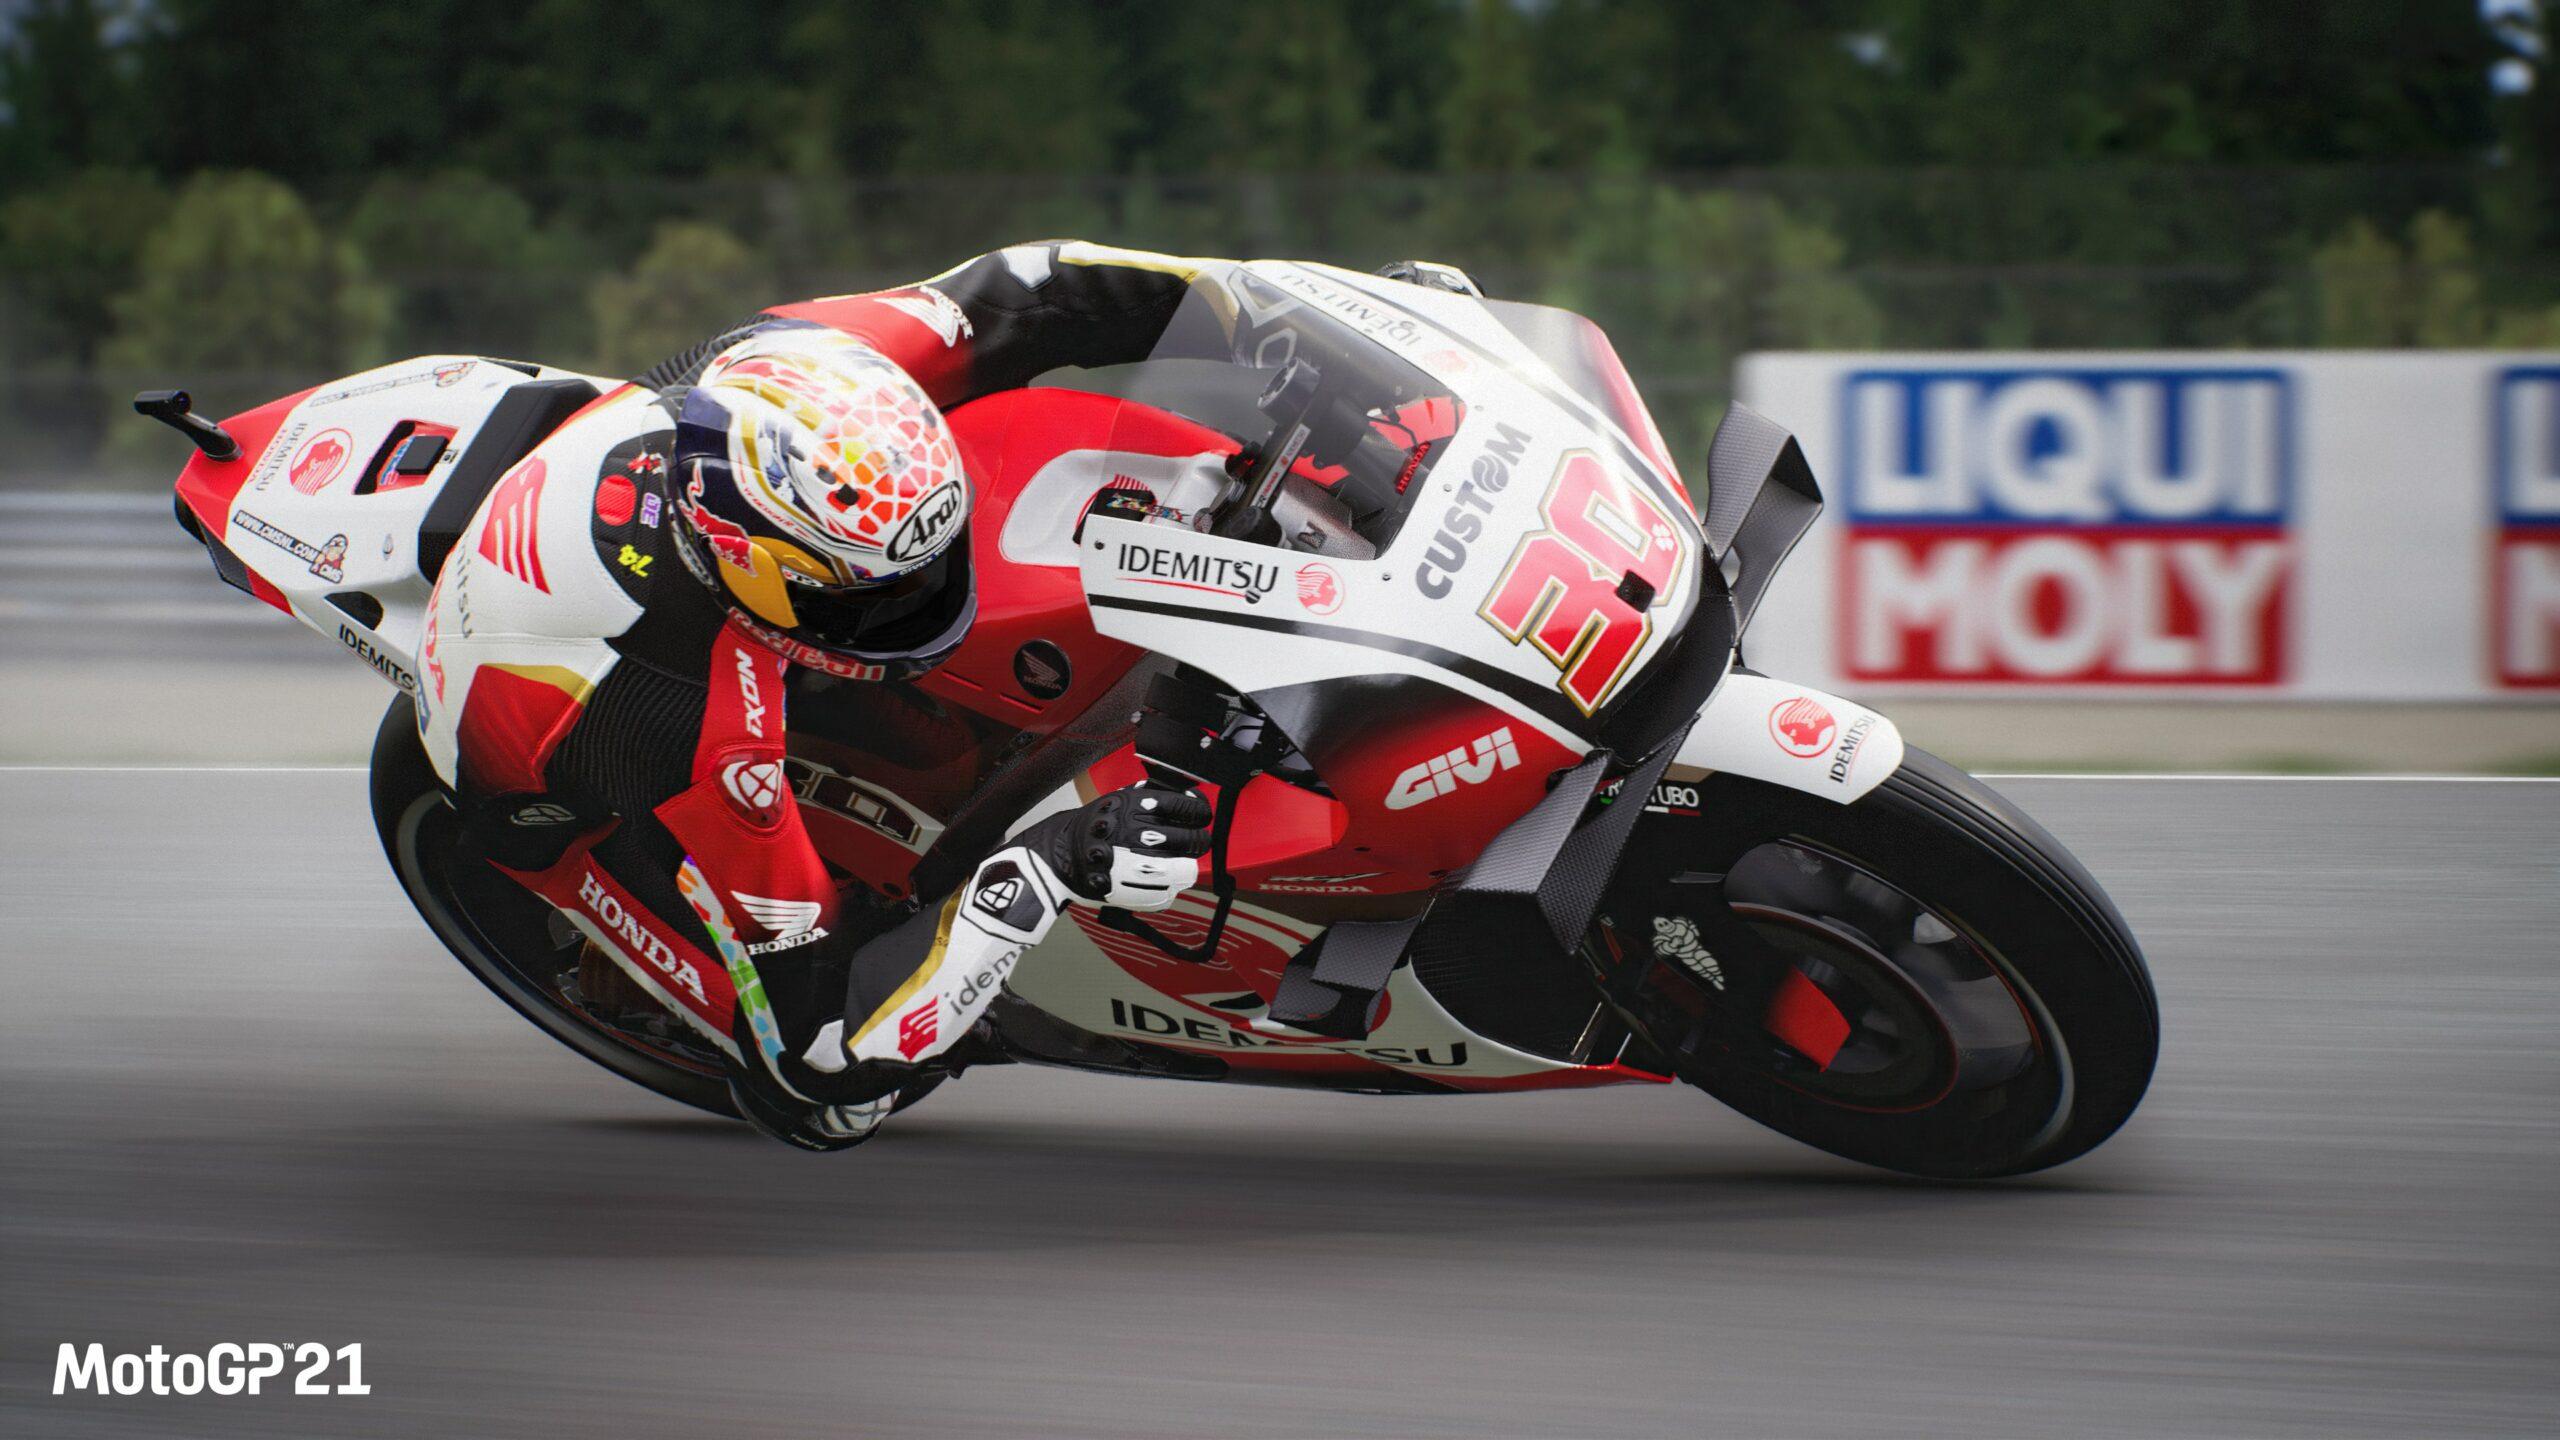 MotoGP-21_2021_02-18-21_003